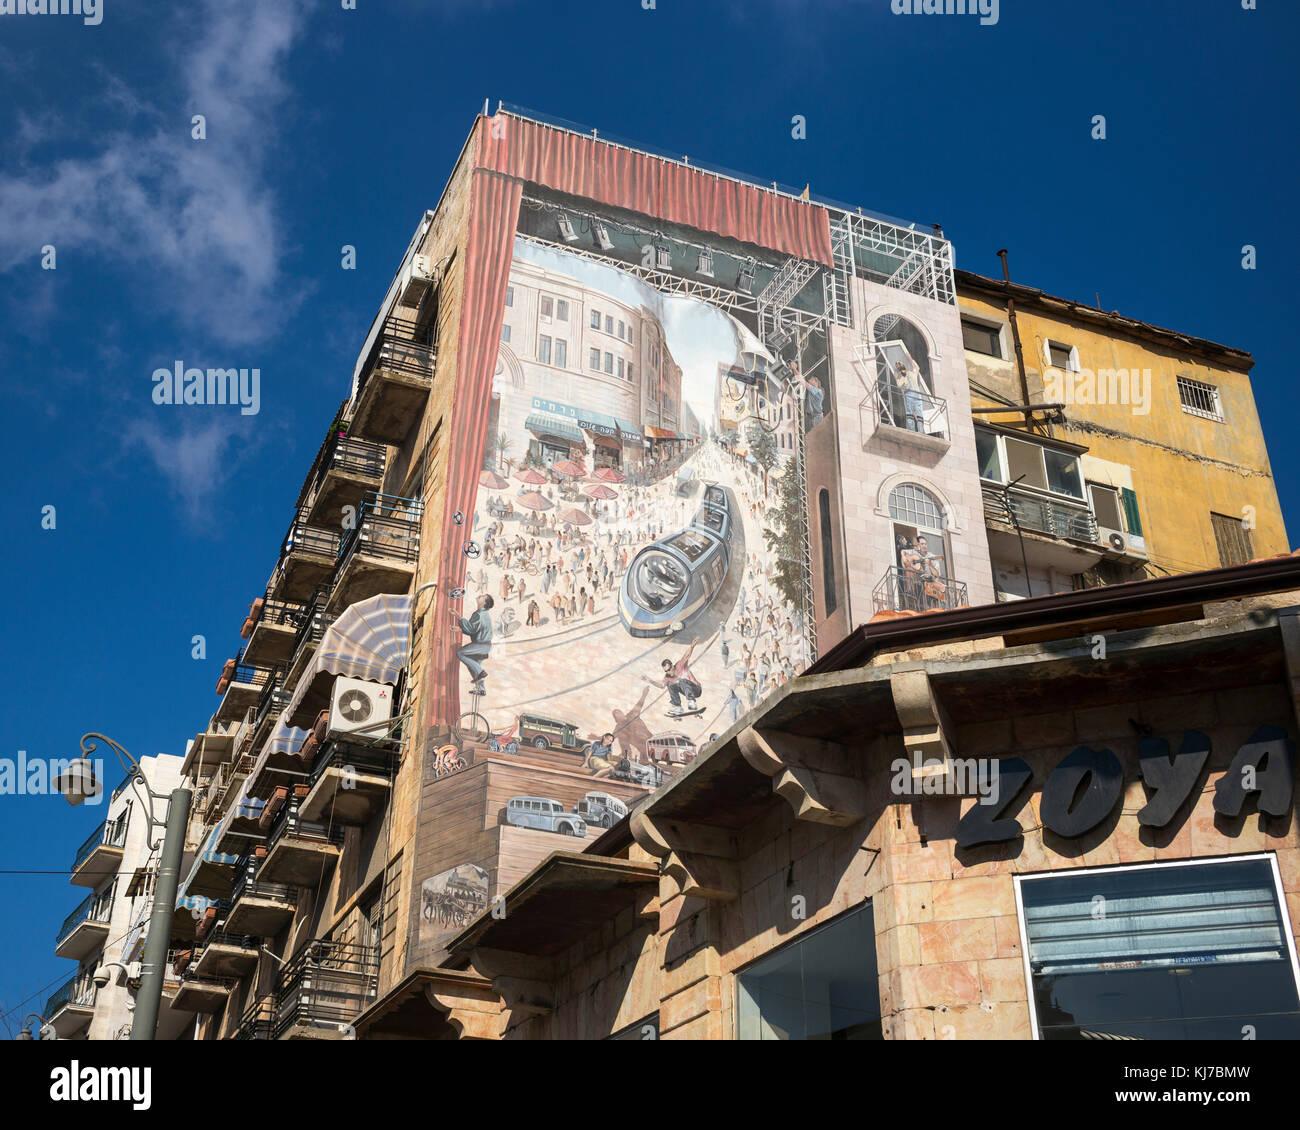 Low angle view of Jerusalem Light Rail Painting on building, Jaffa Road, Jerusalem, Israel - Stock Image